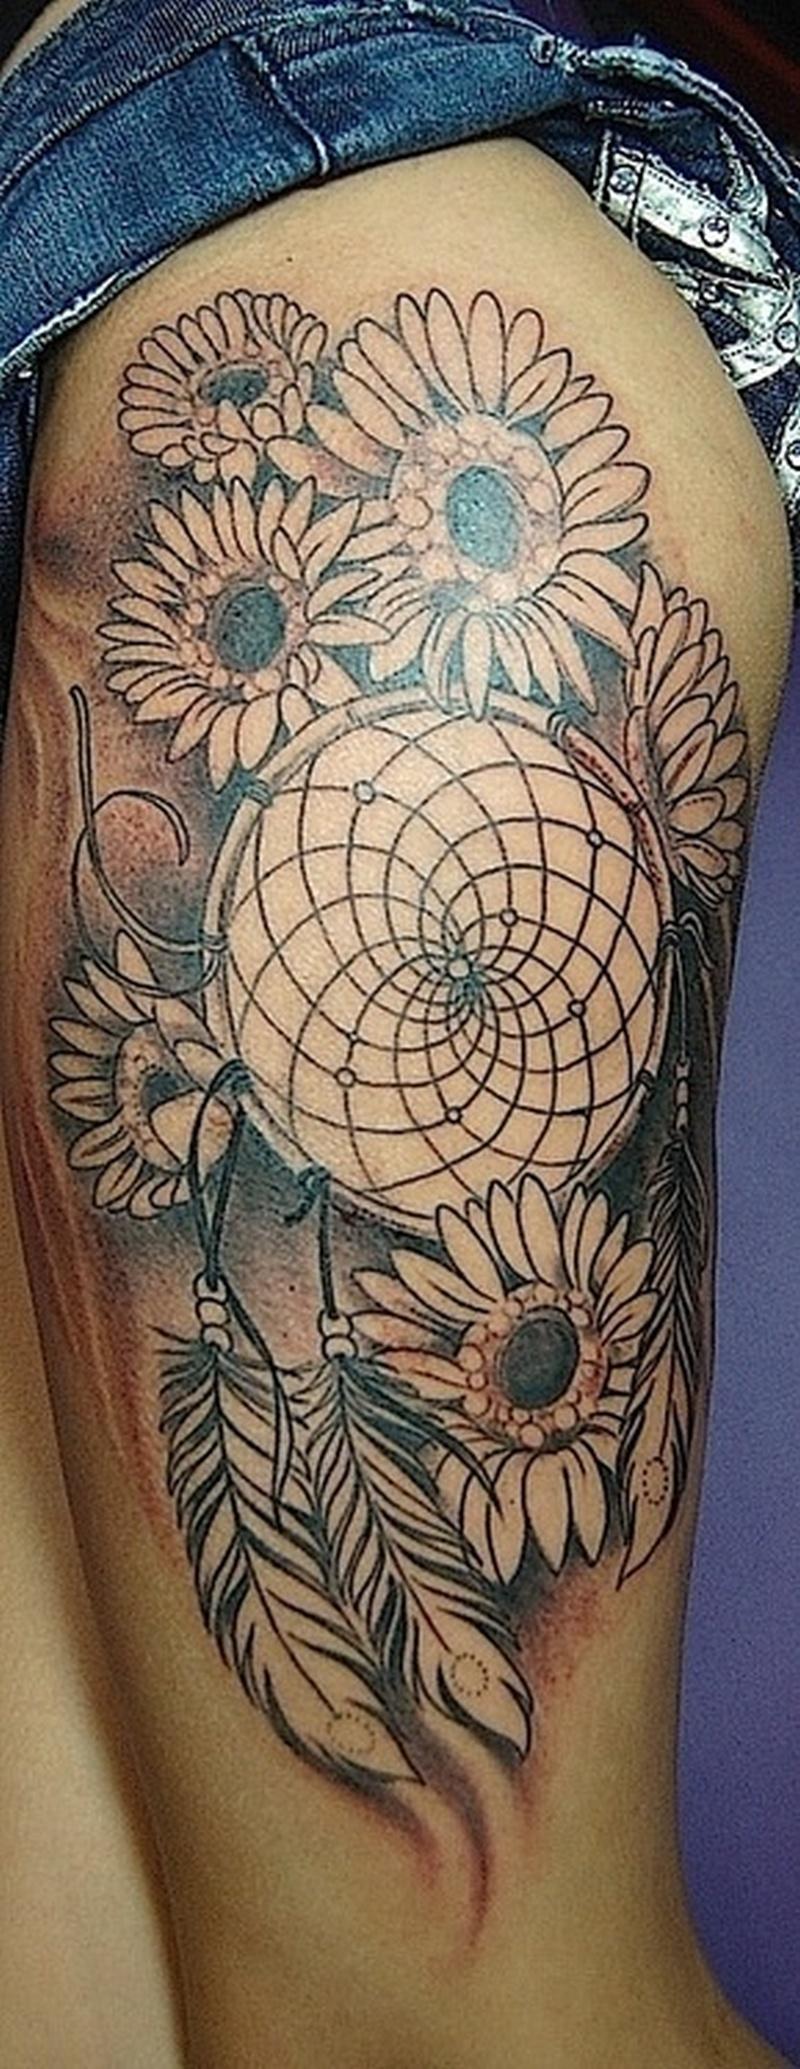 Sunflower n dream catcher tattoo design